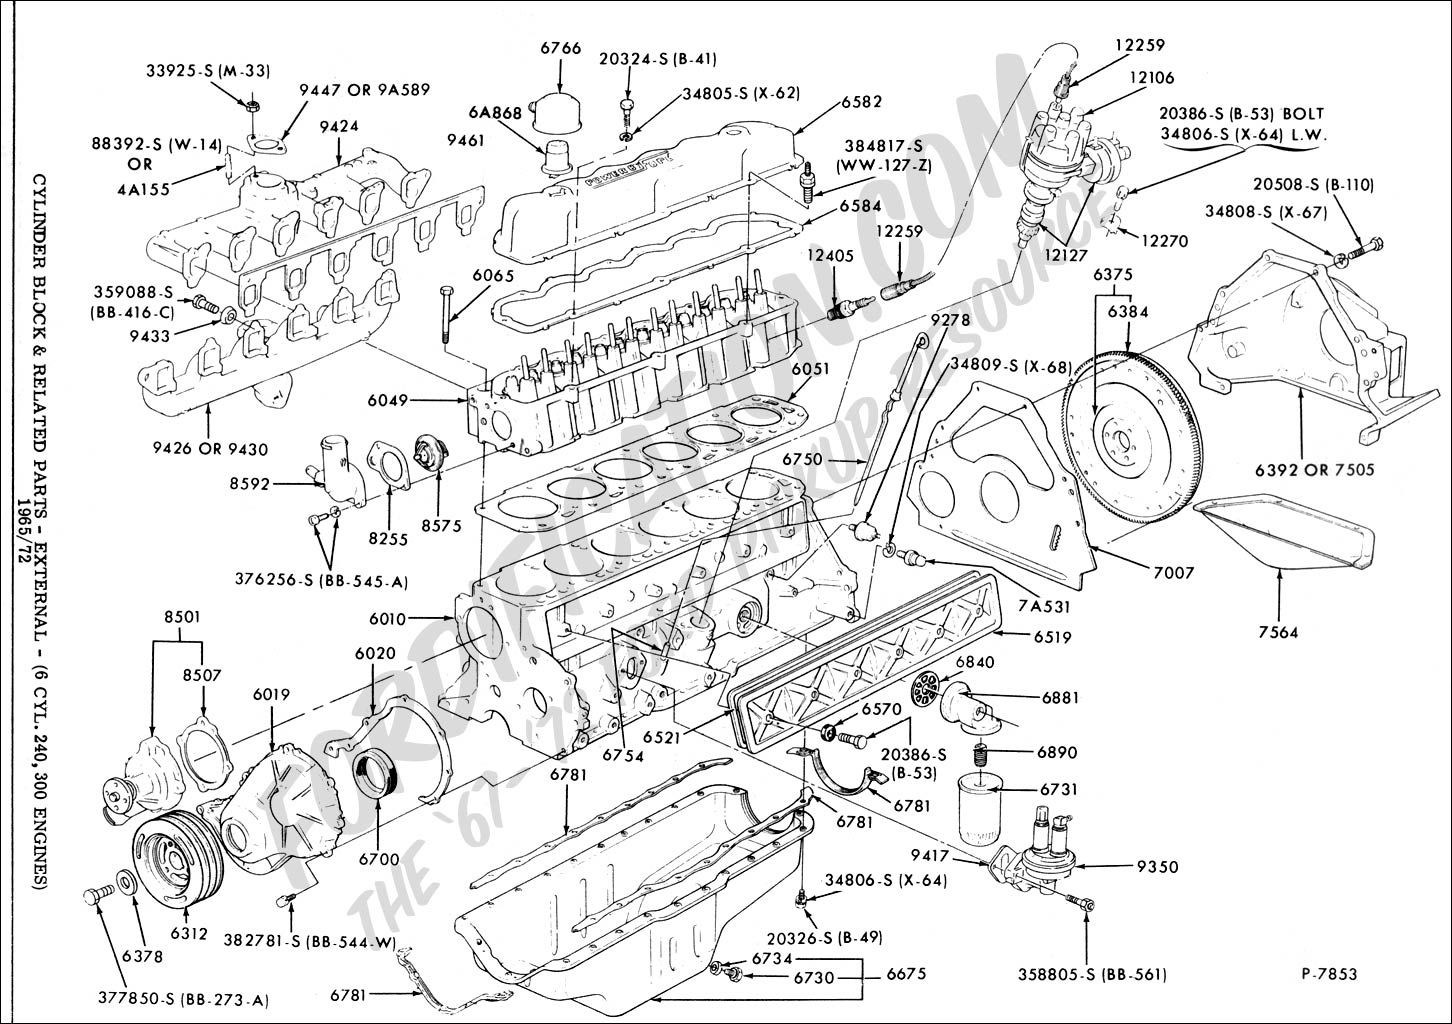 Ford 6 Cylinder Engine Diagram - Wiring Diagram Cycle